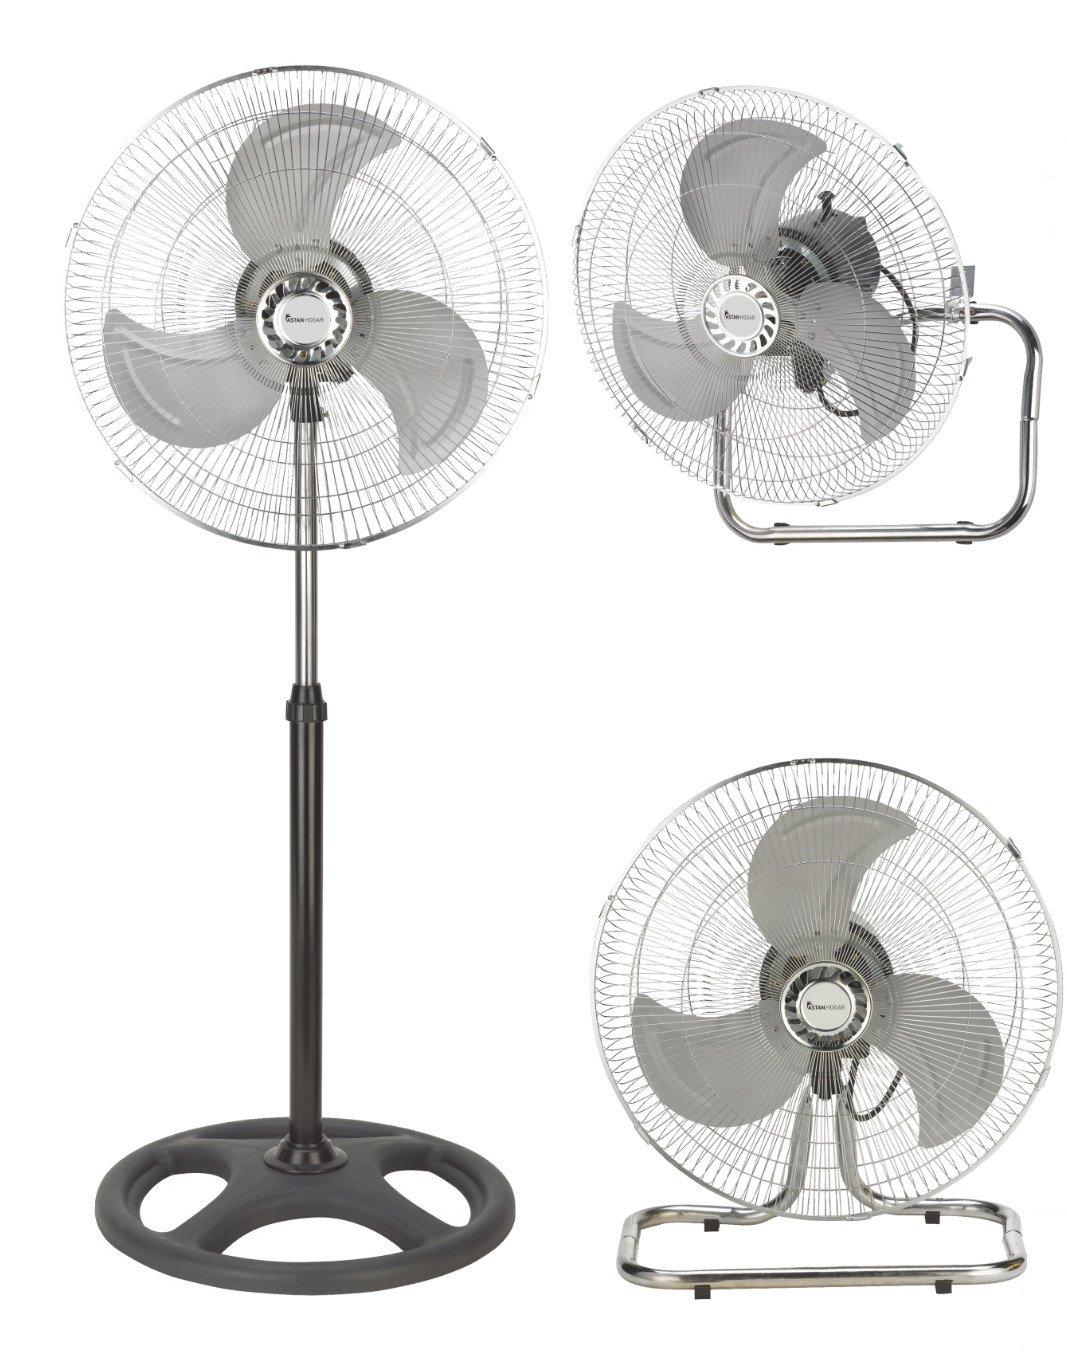 'Ventilatore Oscillante mod.: Sorrento